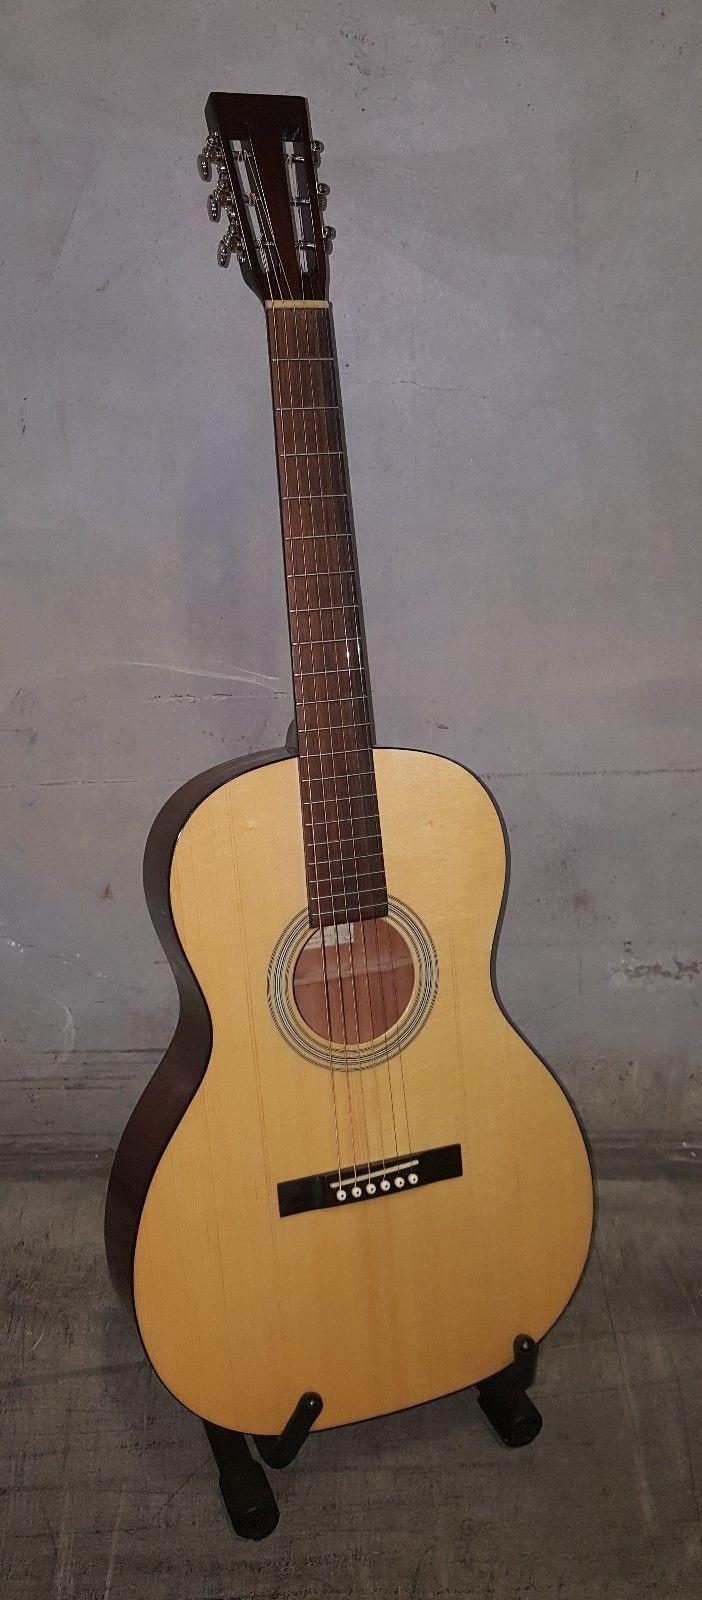 guitar Recording King ROS-06 06 Series 12-Fret 000 Guitar please